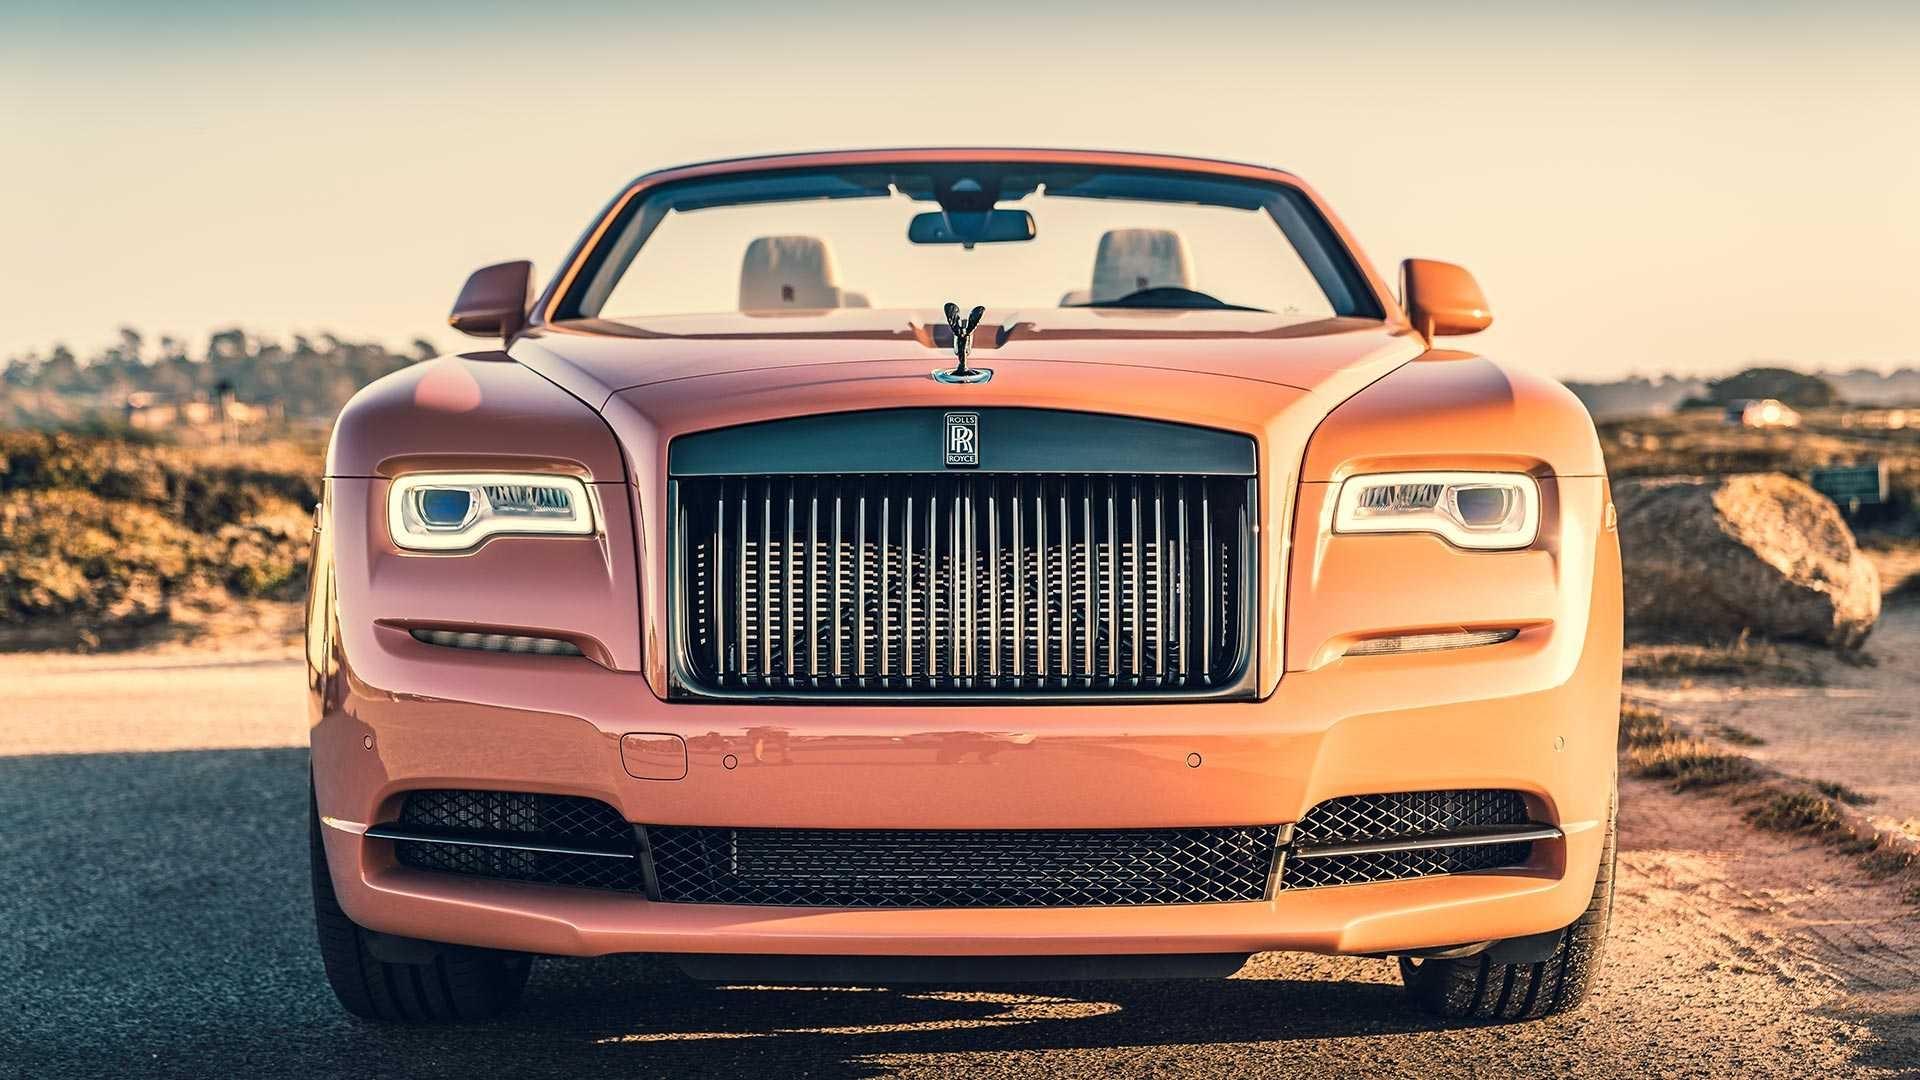 Ngam bo suu tap Rolls-Royce dac biet 'Dem Moscow' hinh anh 24